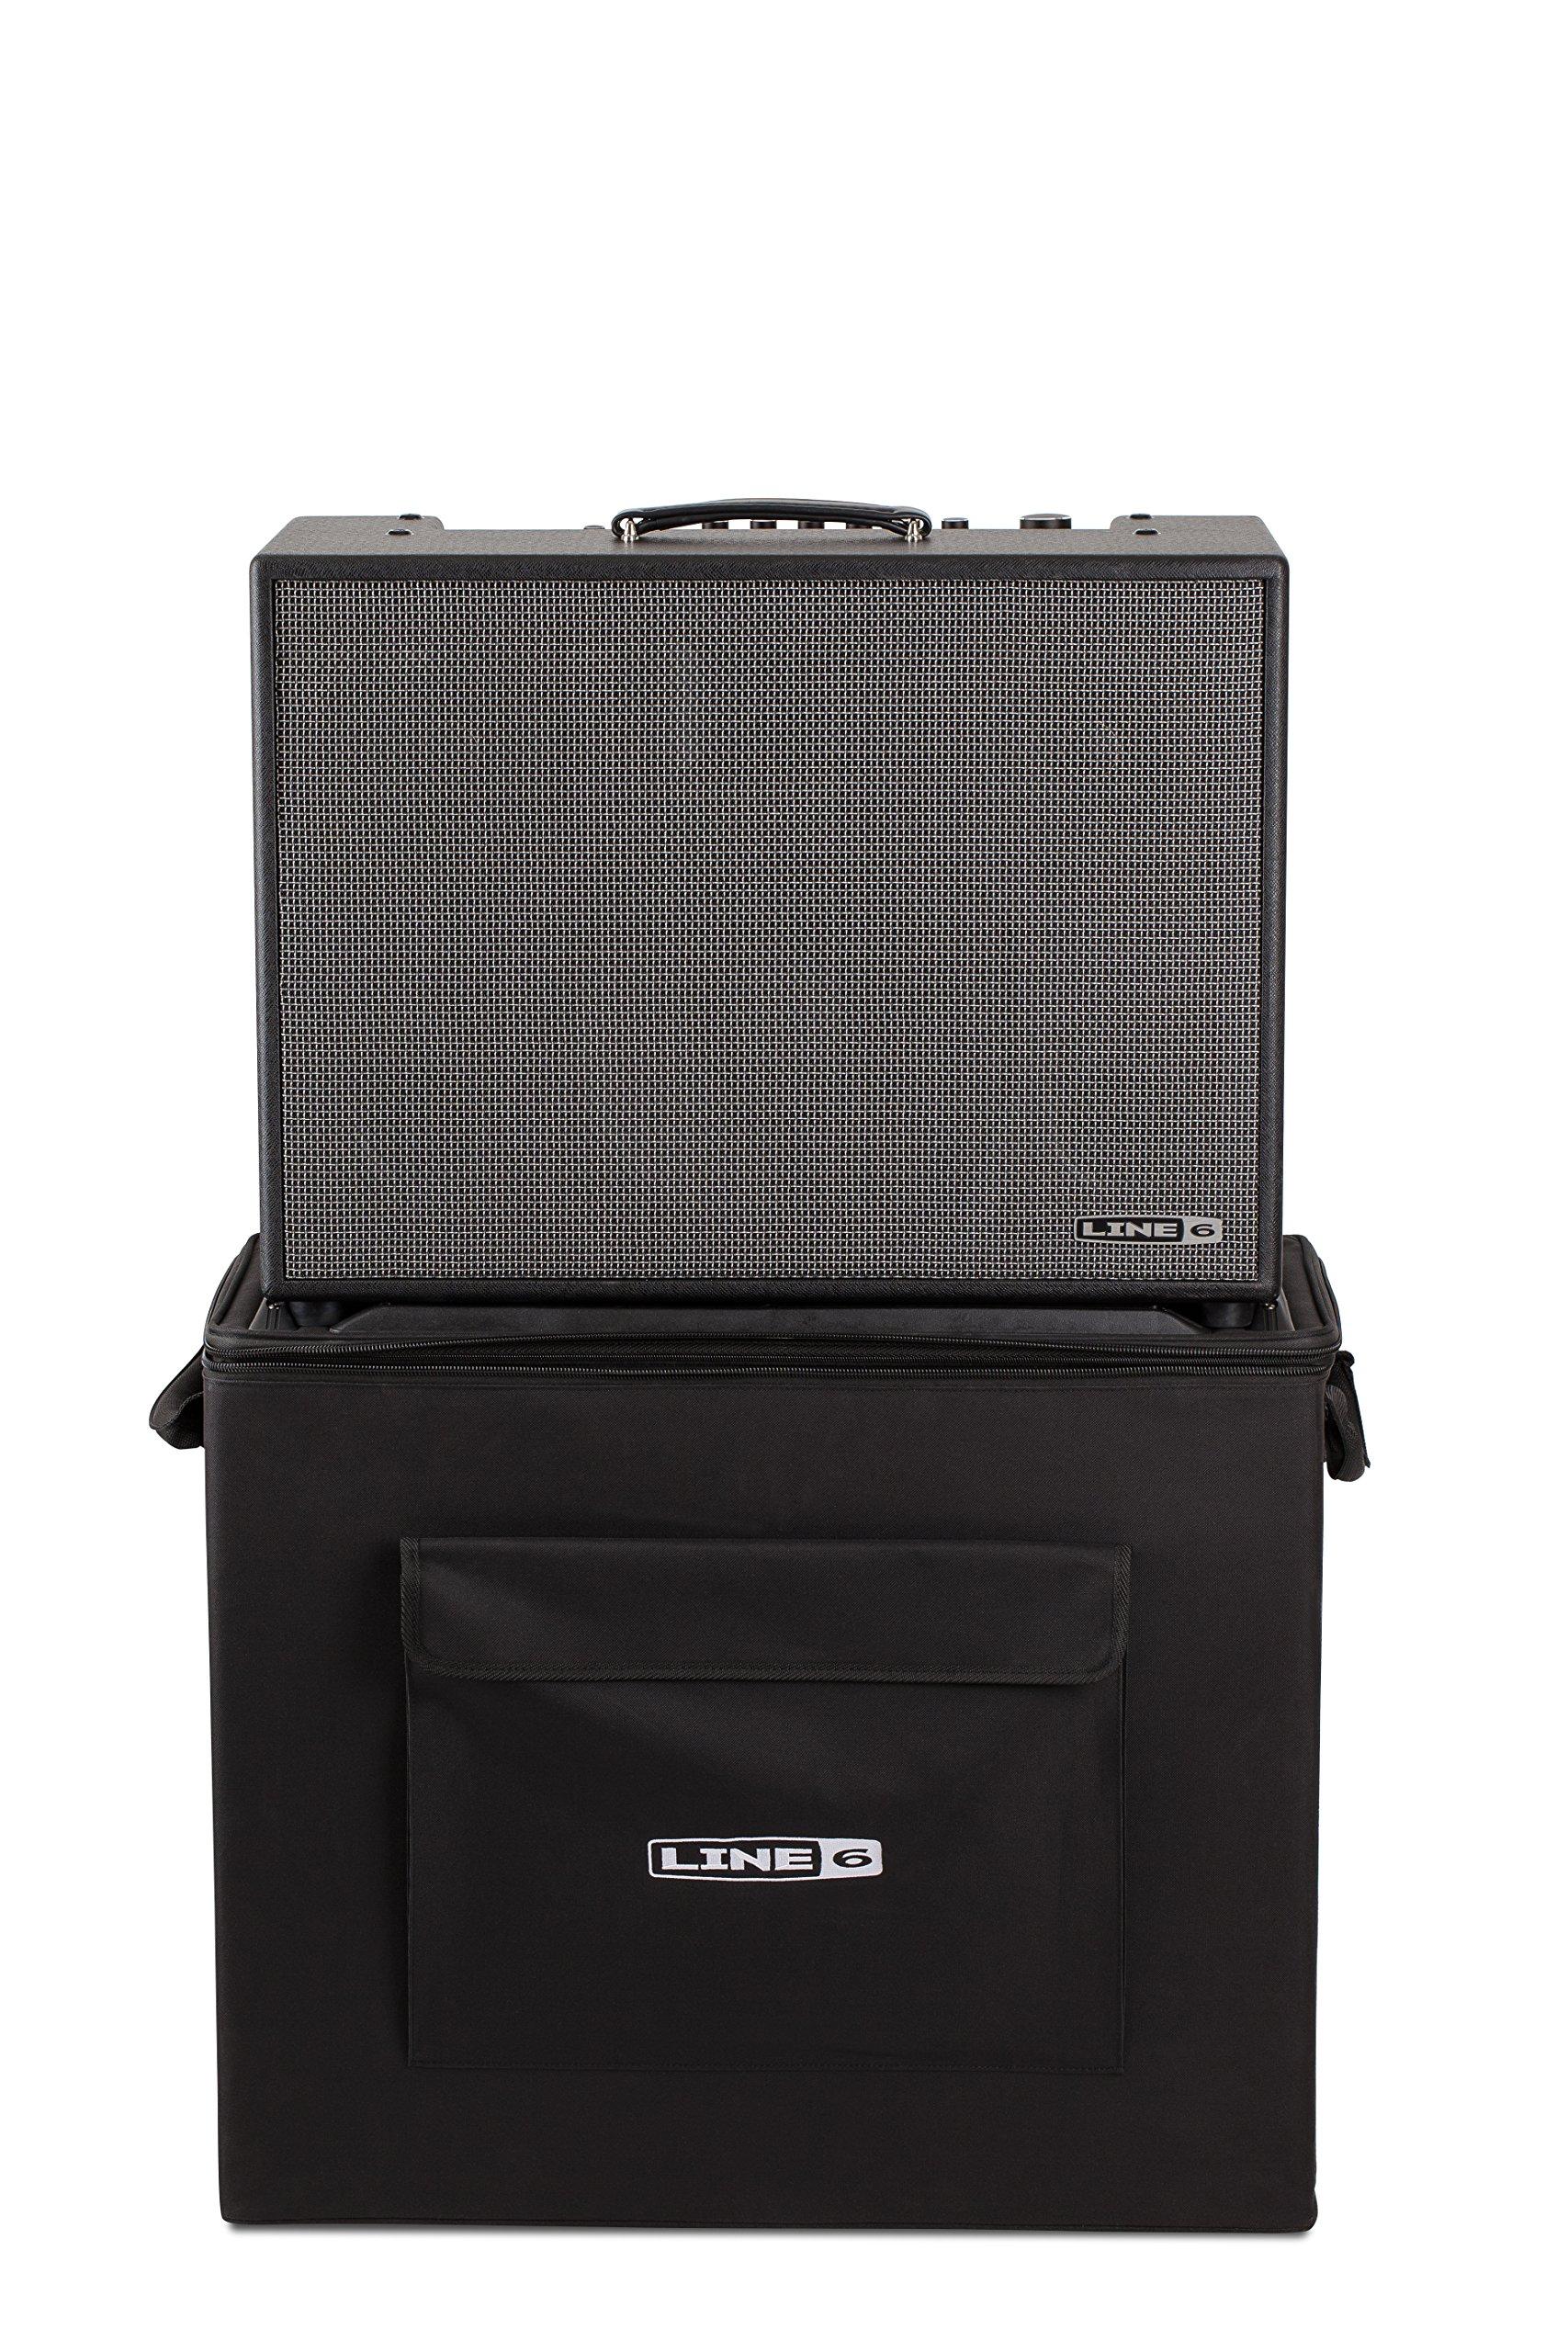 Line 6 Firehawk 1500 Roller Bag Amplifier Bag